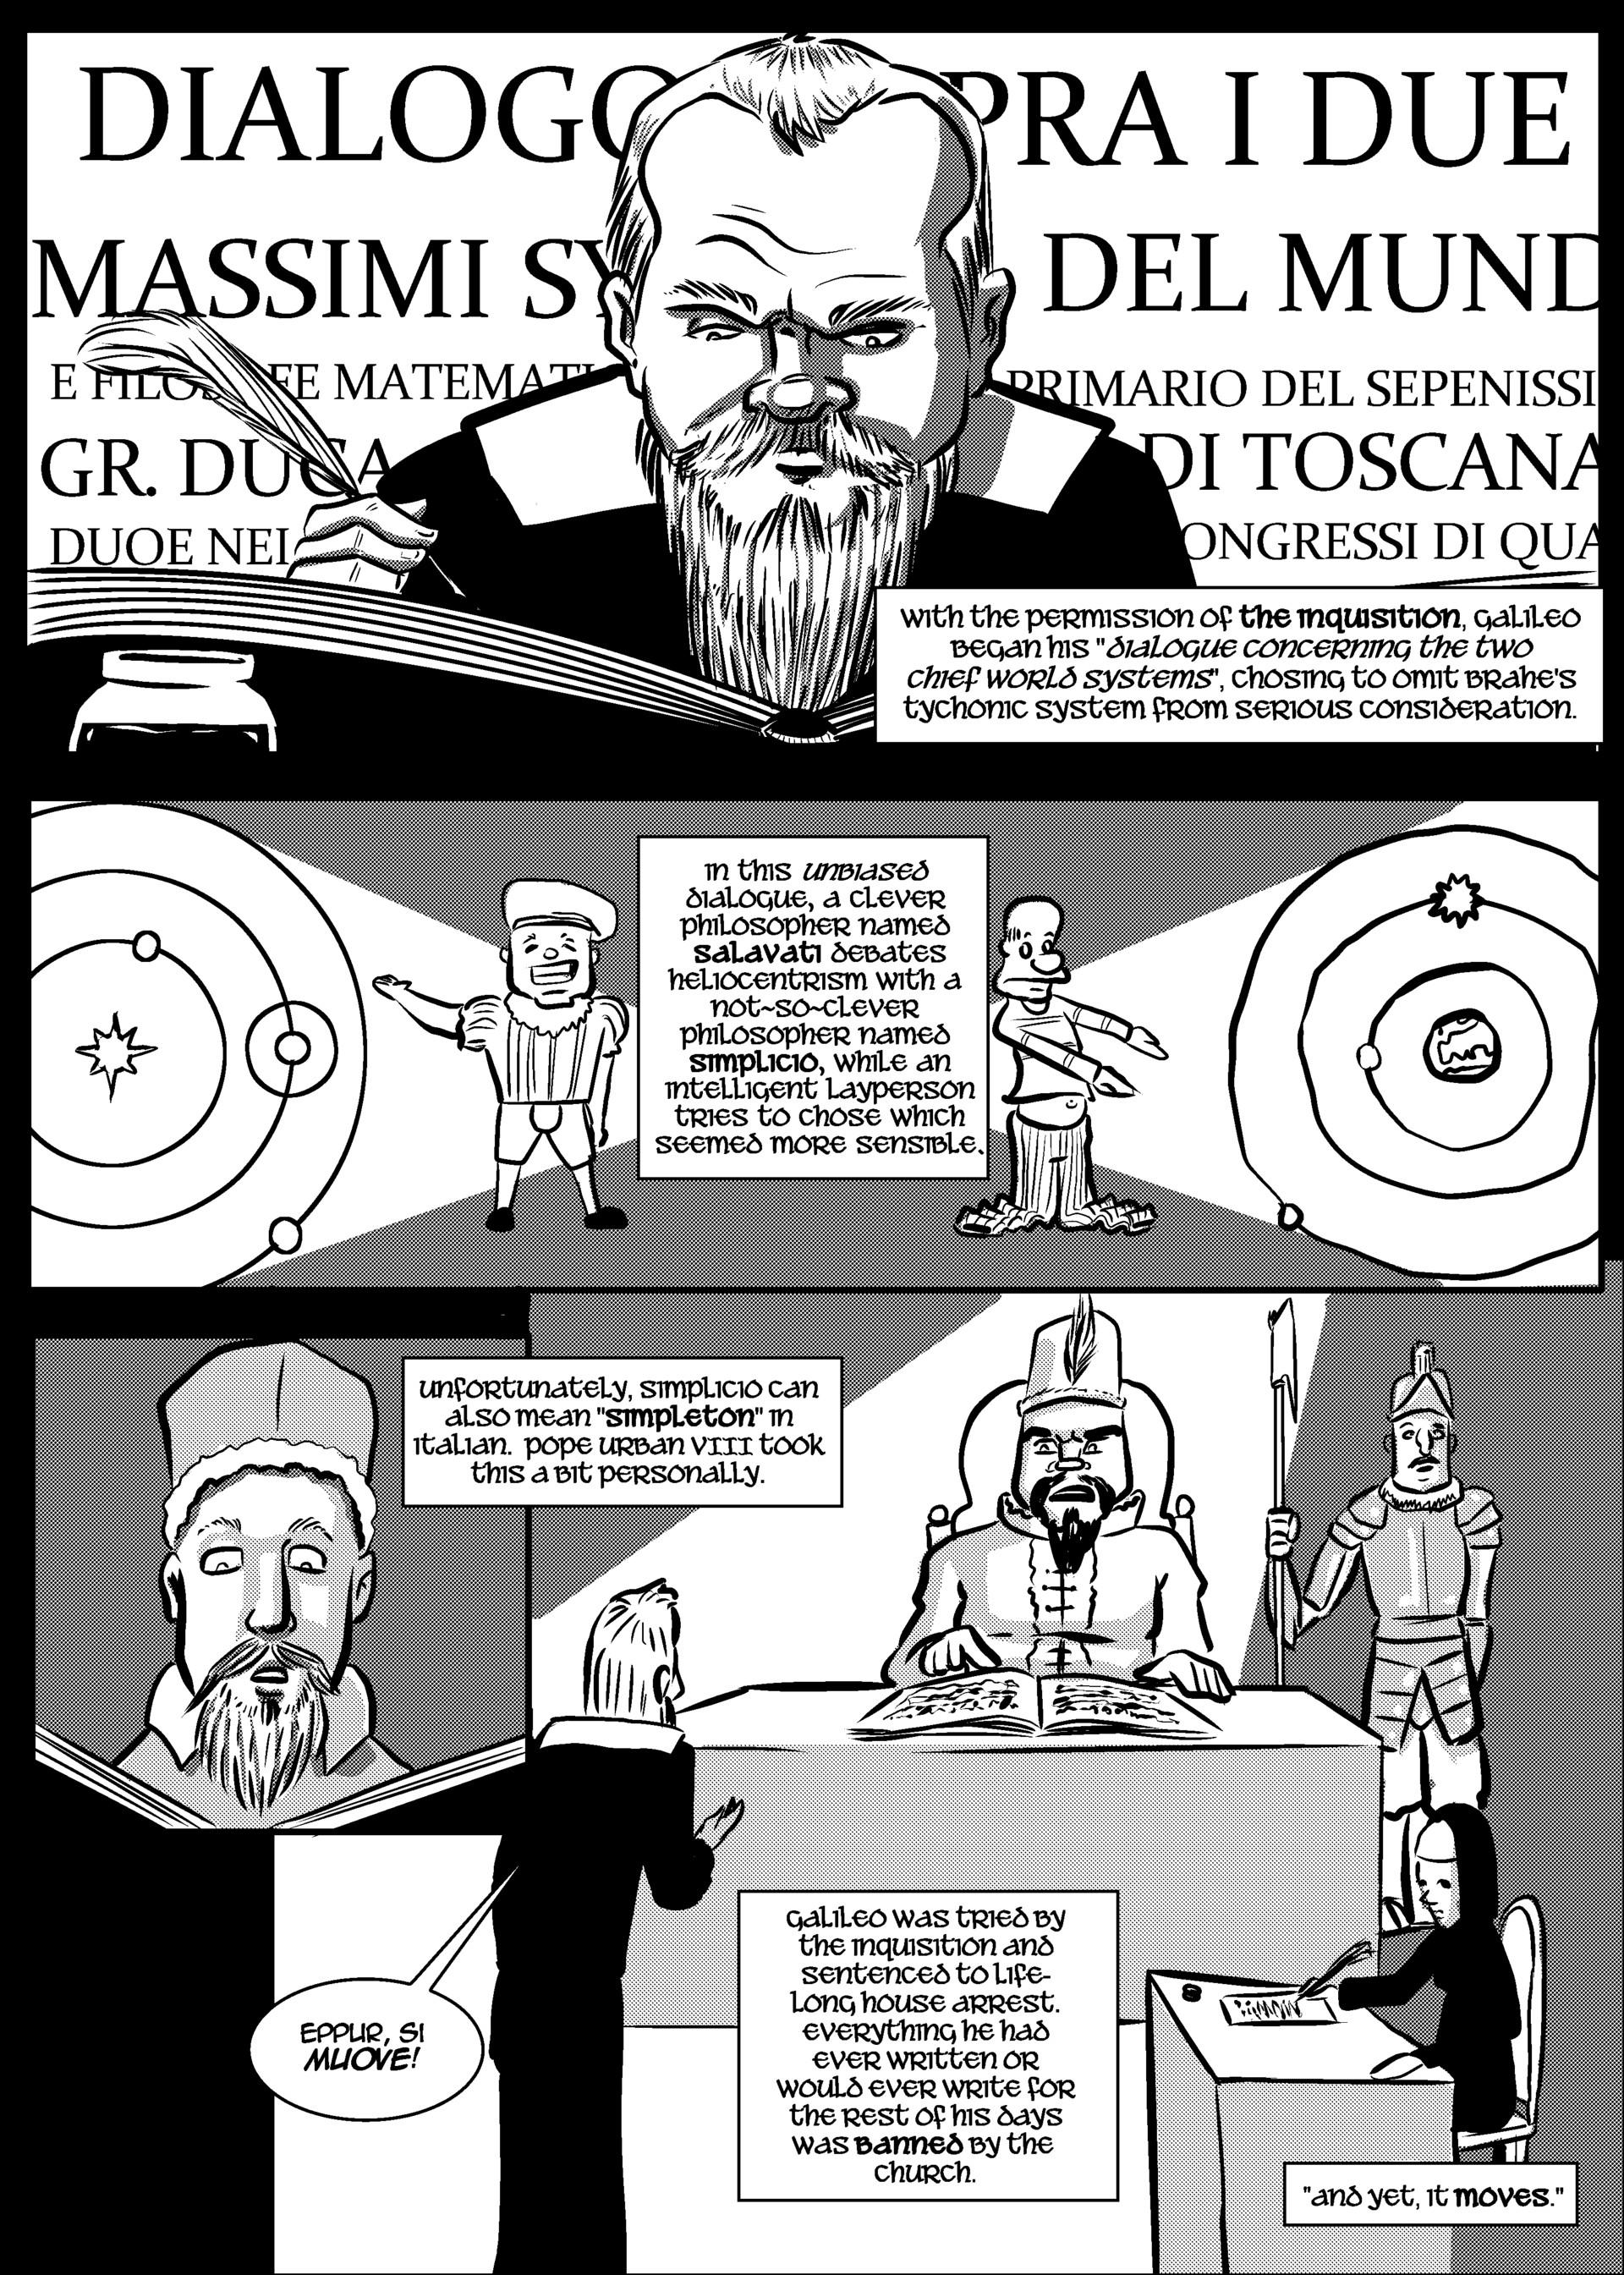 Michael davis heroes of the scientific revolution 006